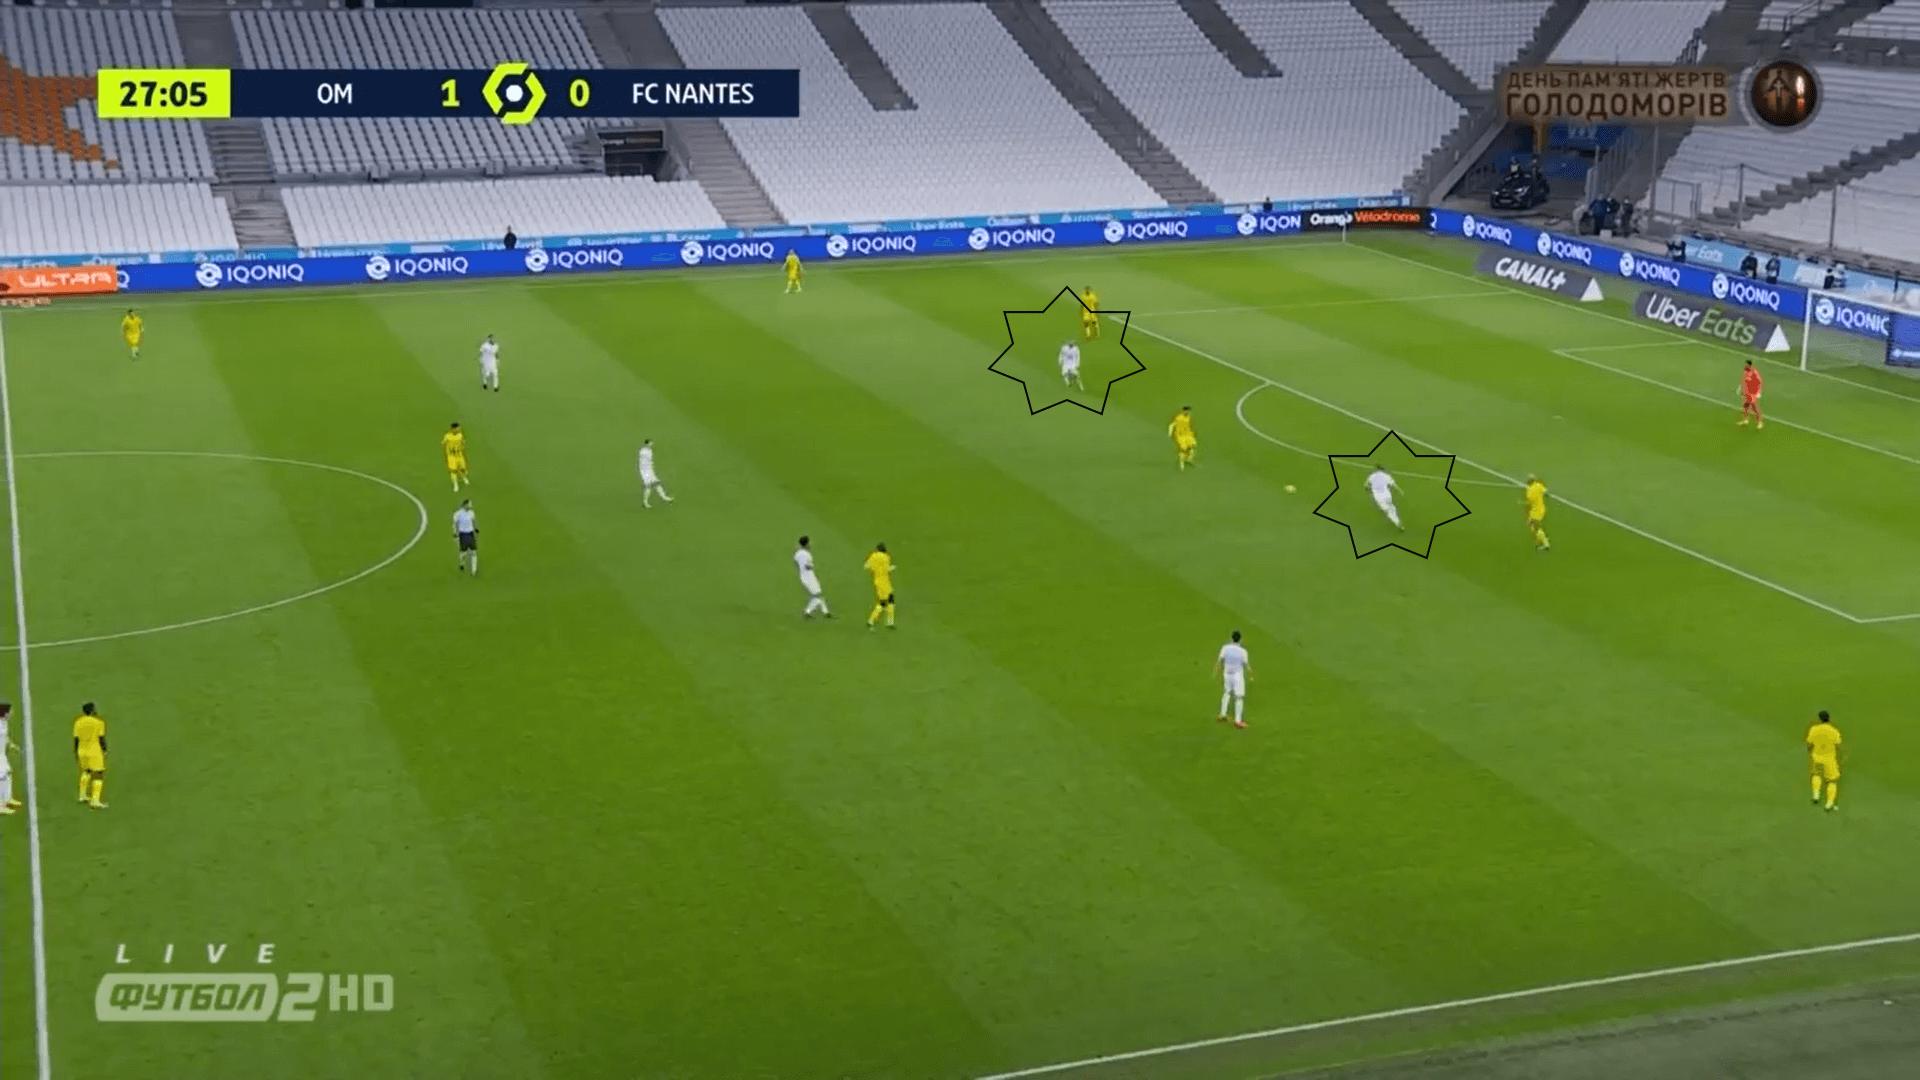 Ligue 1 2020/21: Marseille vs Nantes - tactical analysis tactics